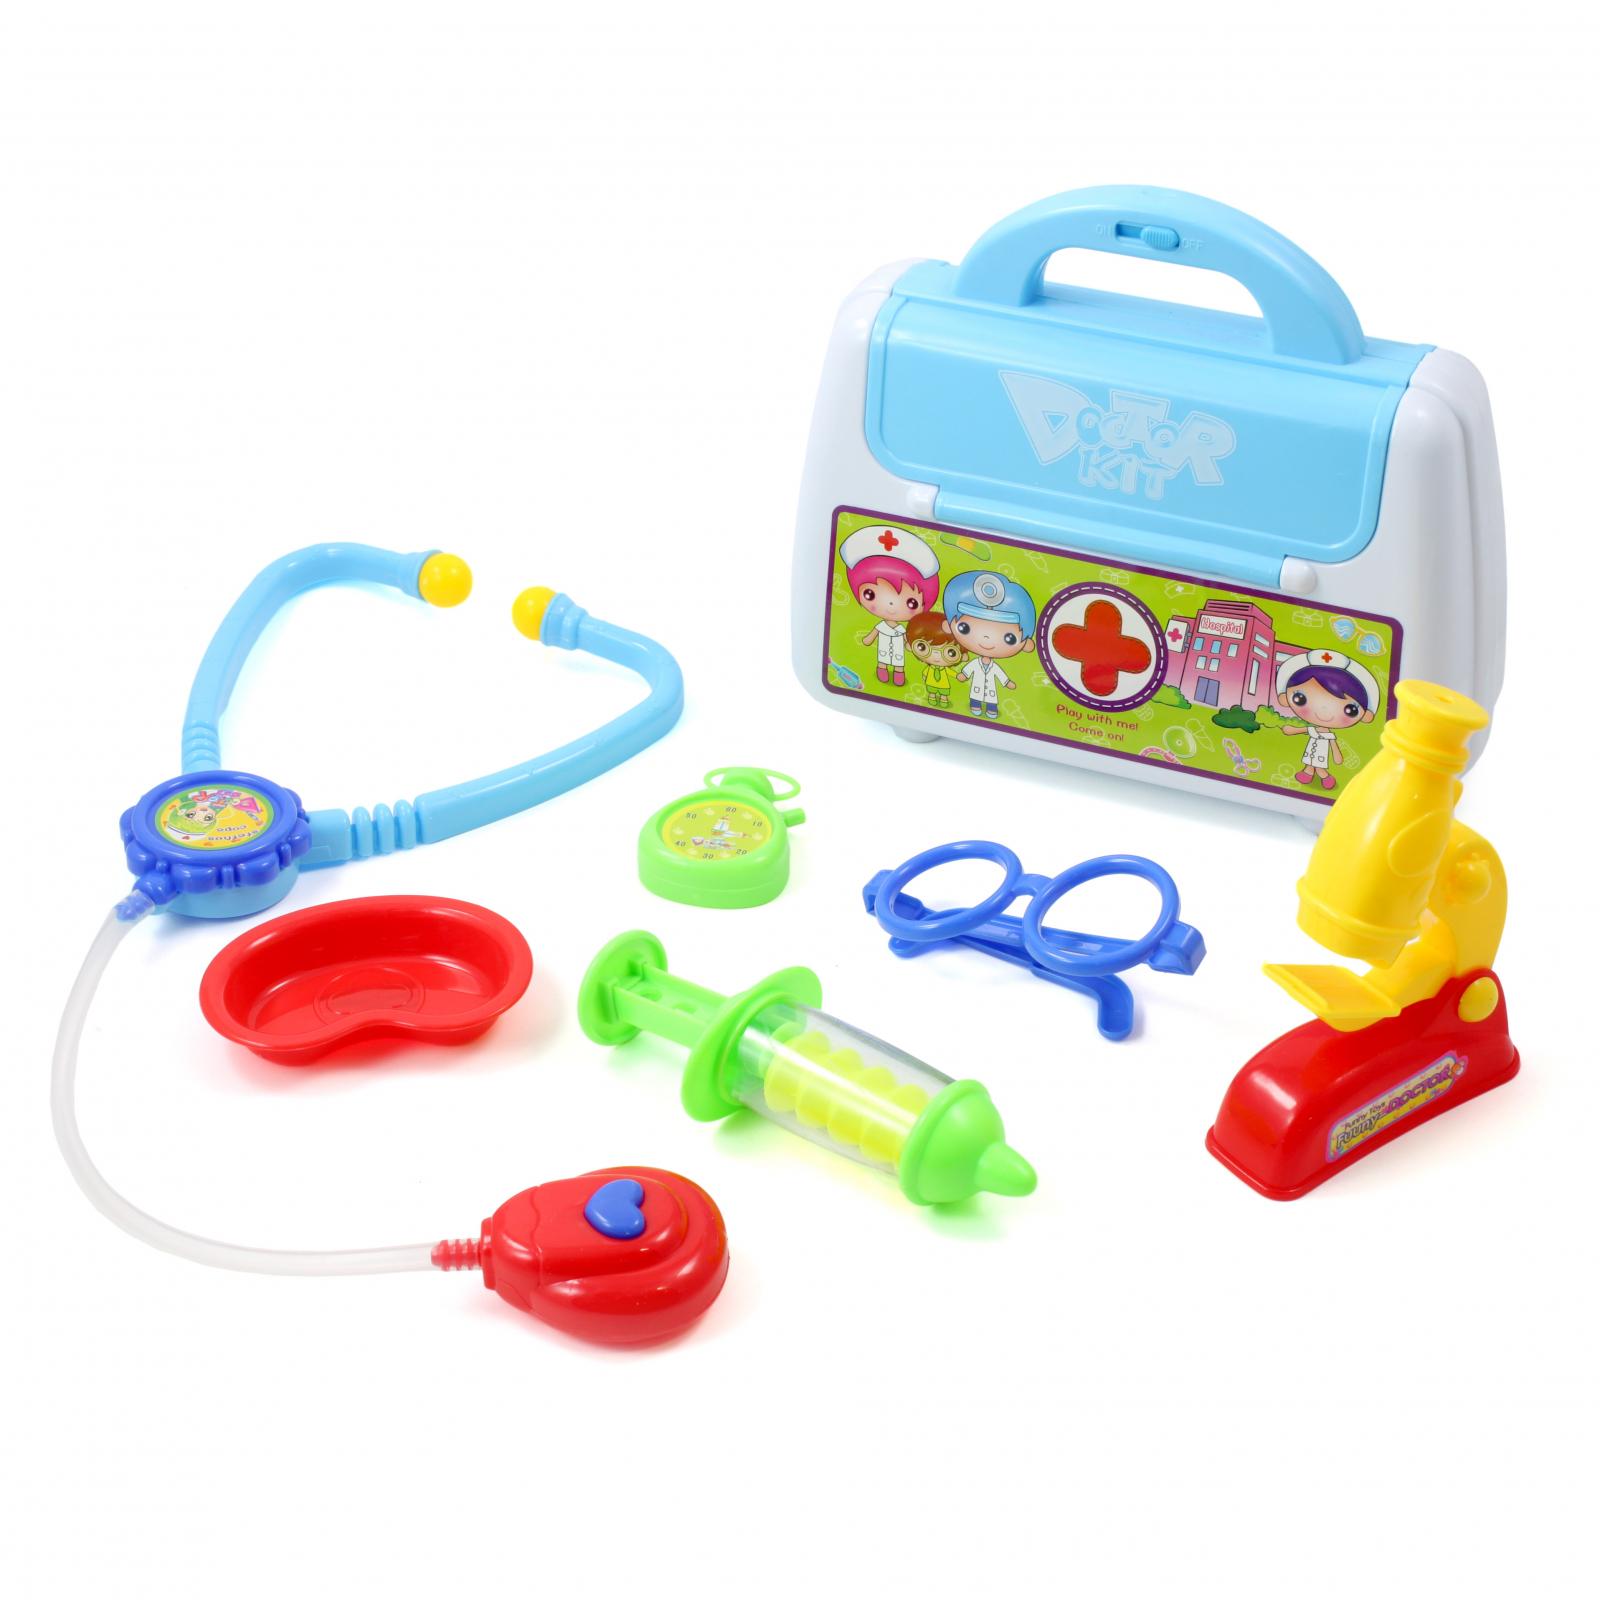 7pc Children's Doctor Equipment Pretend Play Set Blue